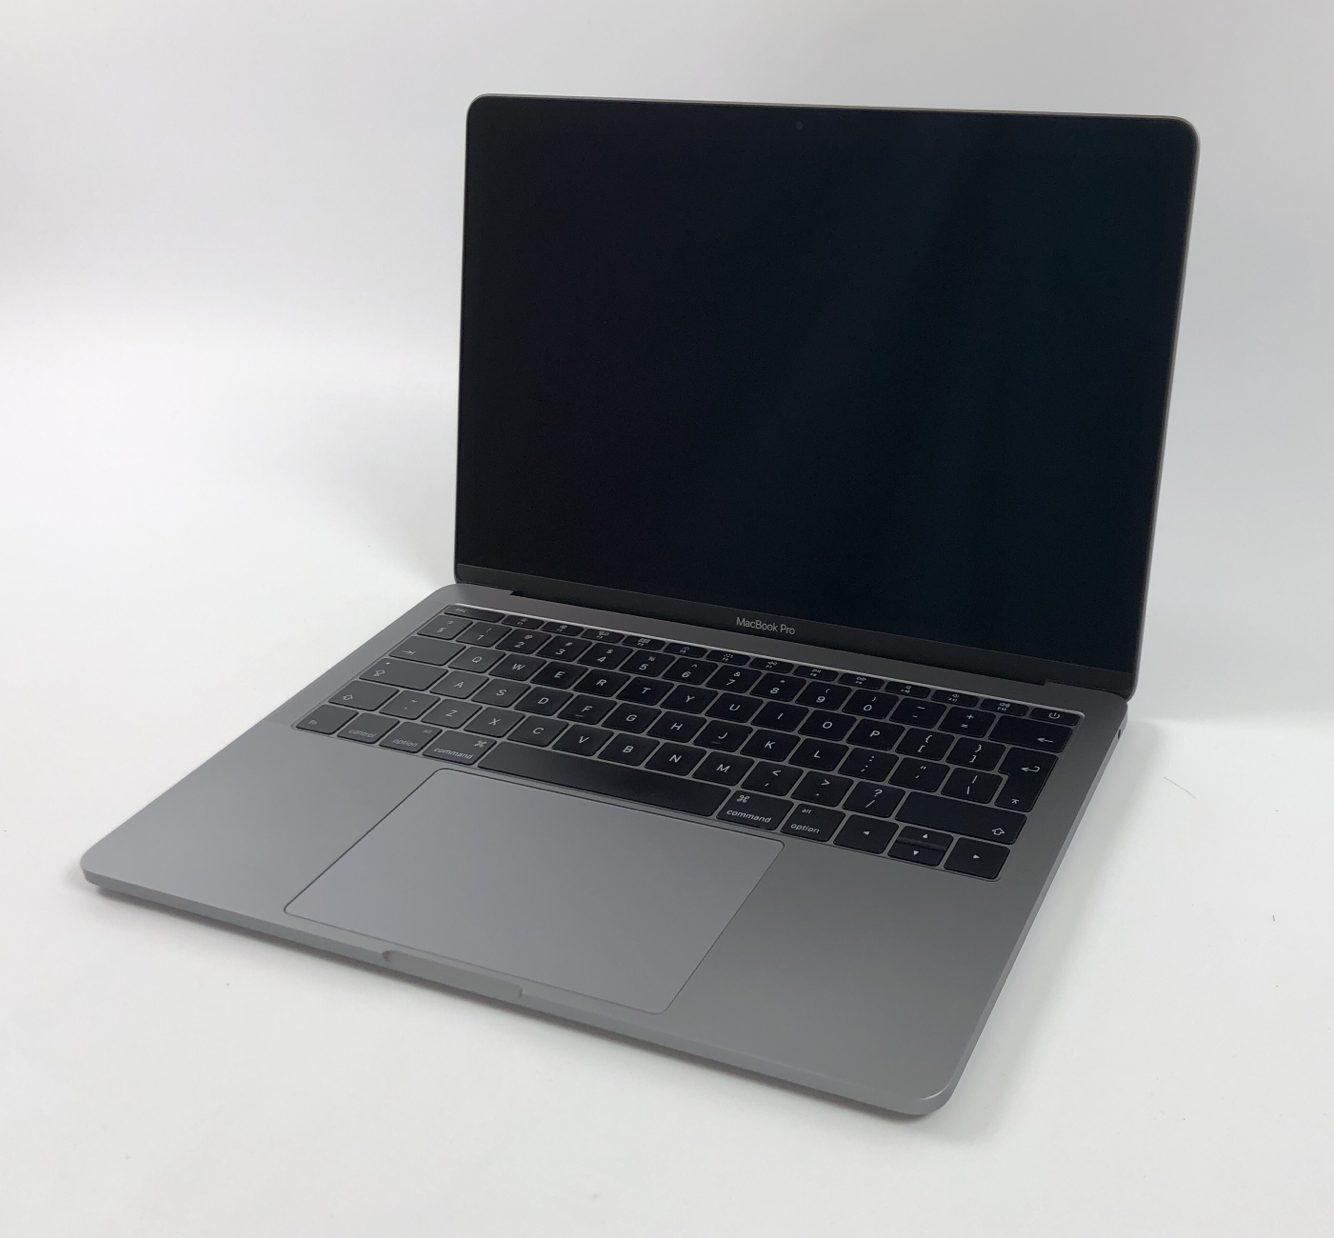 "MacBook Pro 13"" 2TBT Late 2016 (Intel Core i5 2.0 GHz 8 GB RAM 256 GB SSD), Space Gray, Intel Core i5 2.0 GHz, 8 GB RAM, 256 GB SSD, Afbeelding 1"